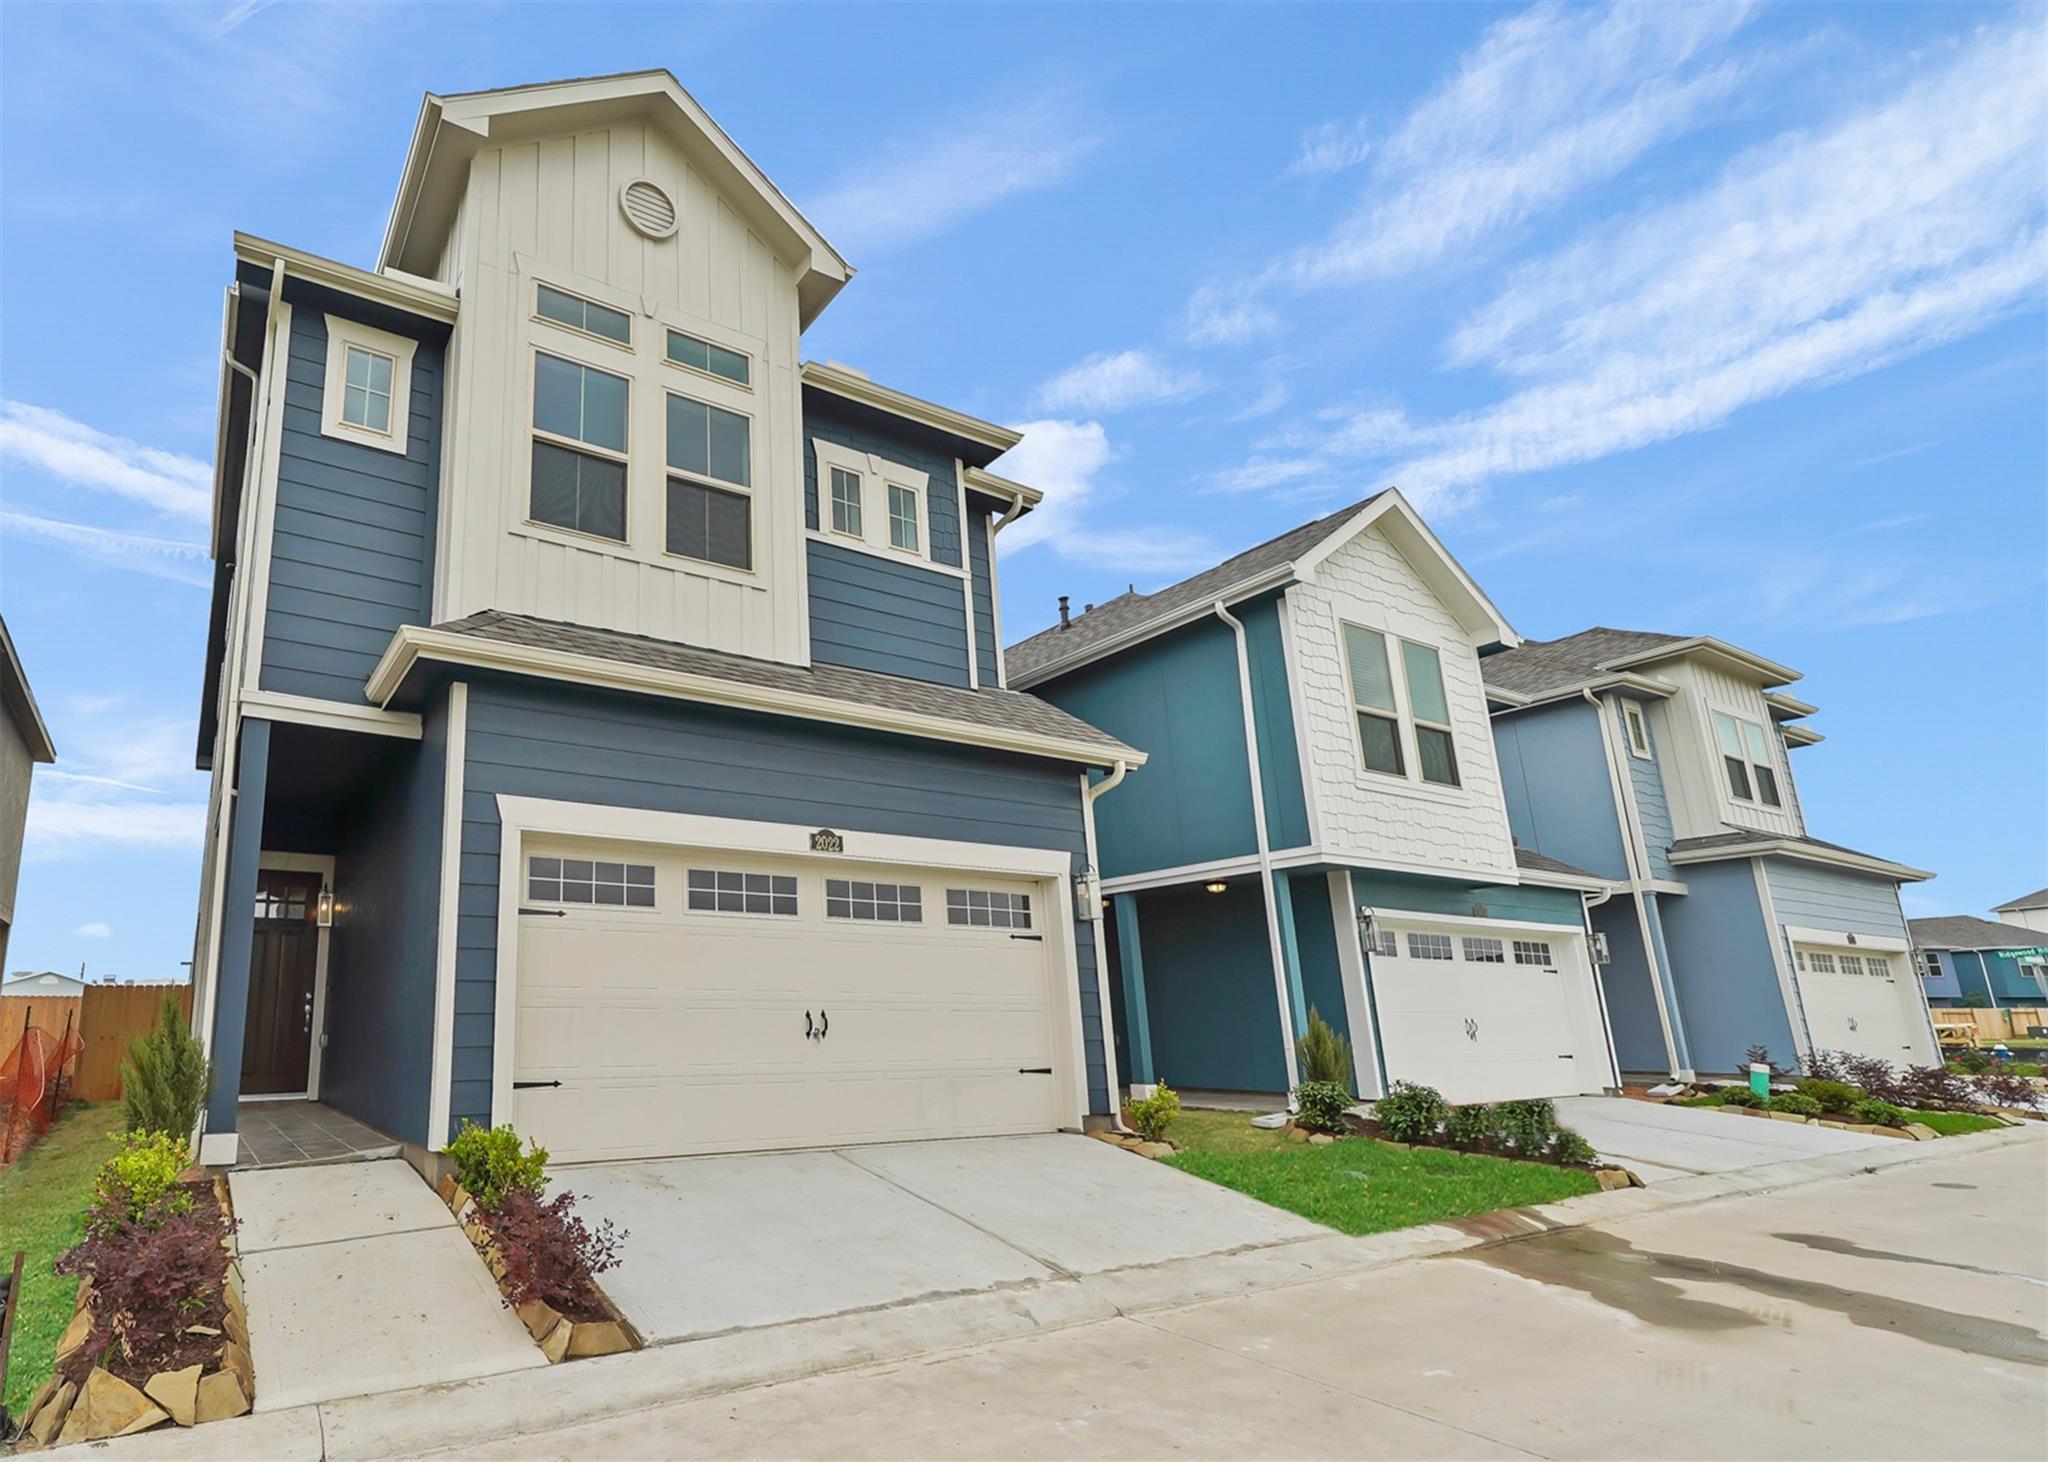 2022 Millbridge Spring Lane Property Photo - Houston, TX real estate listing